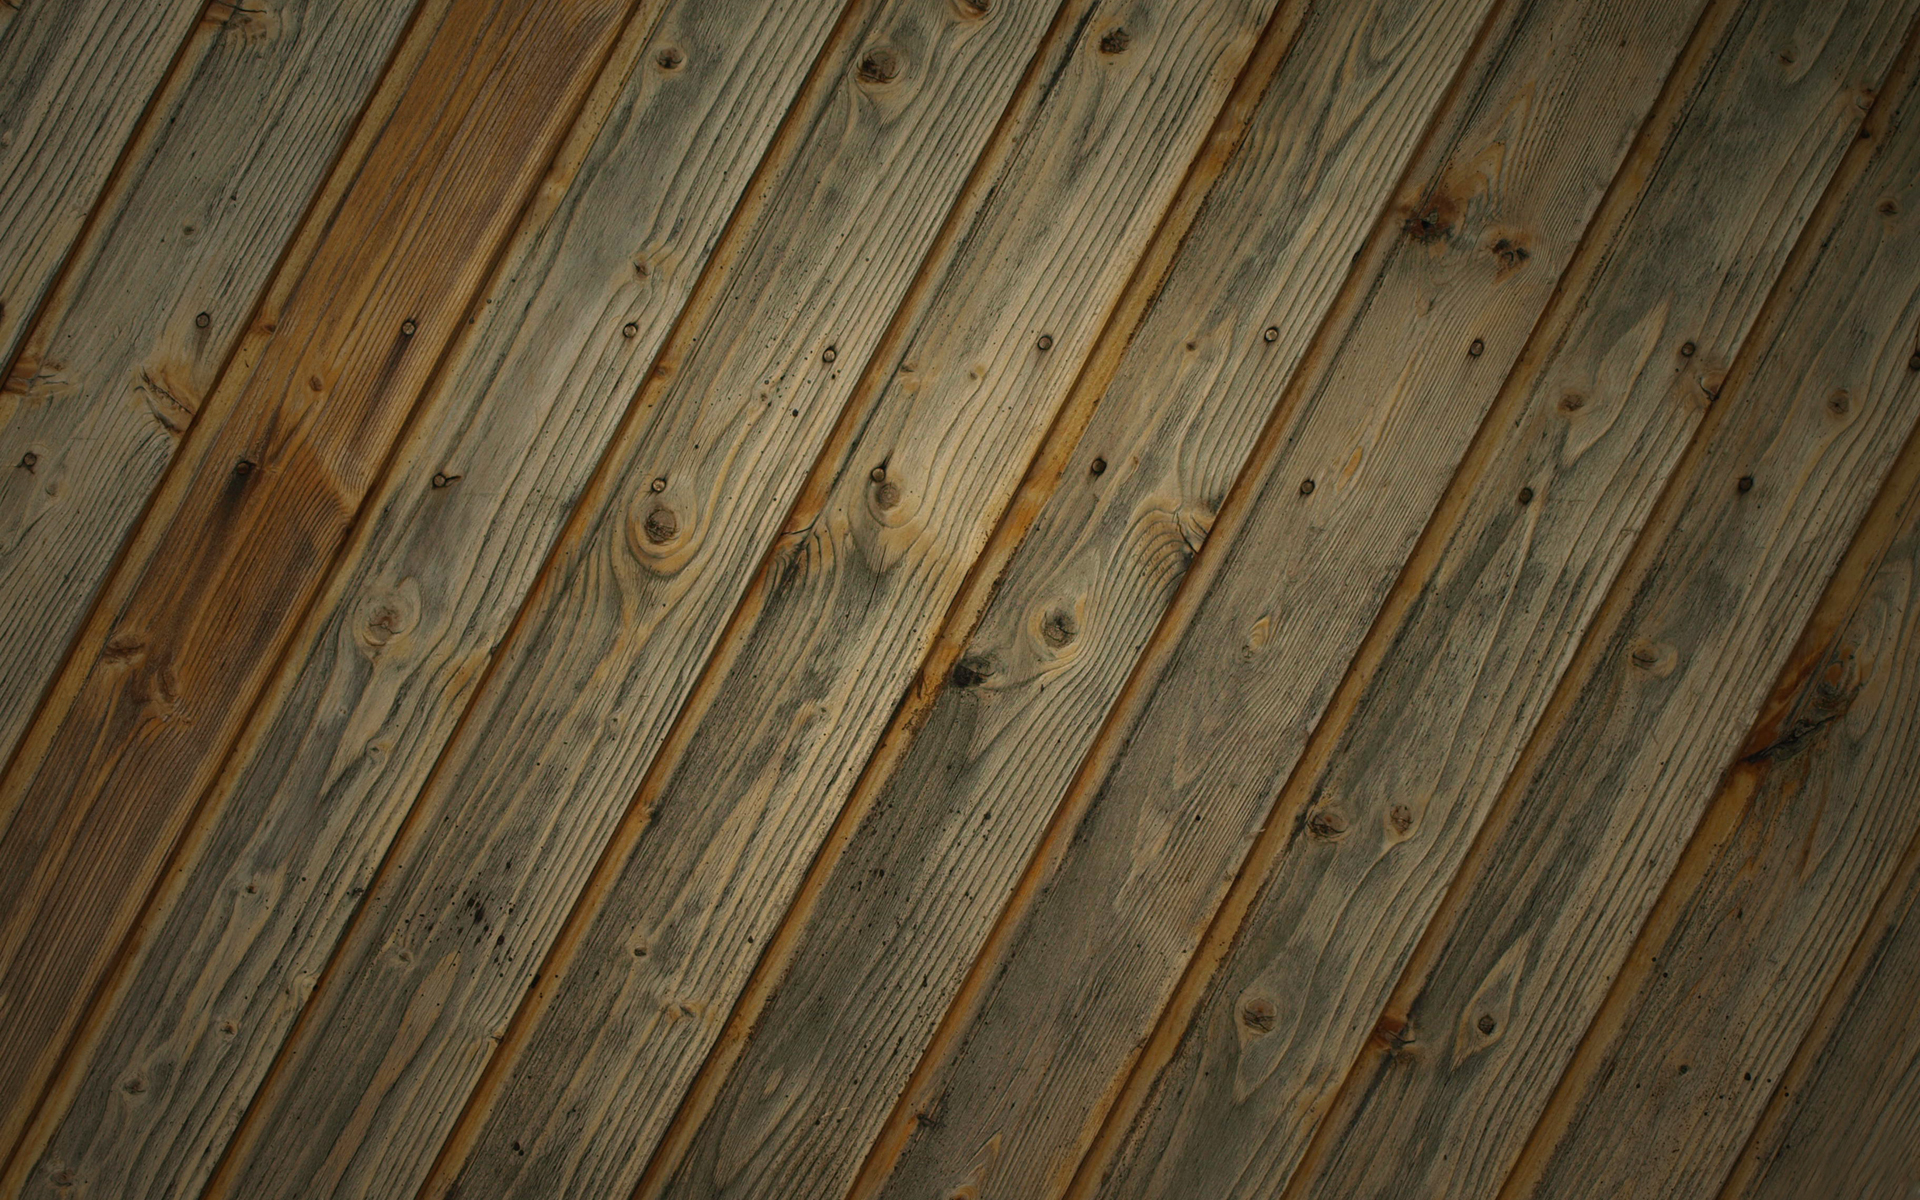 Textura de tablas de madera - 1920x1200